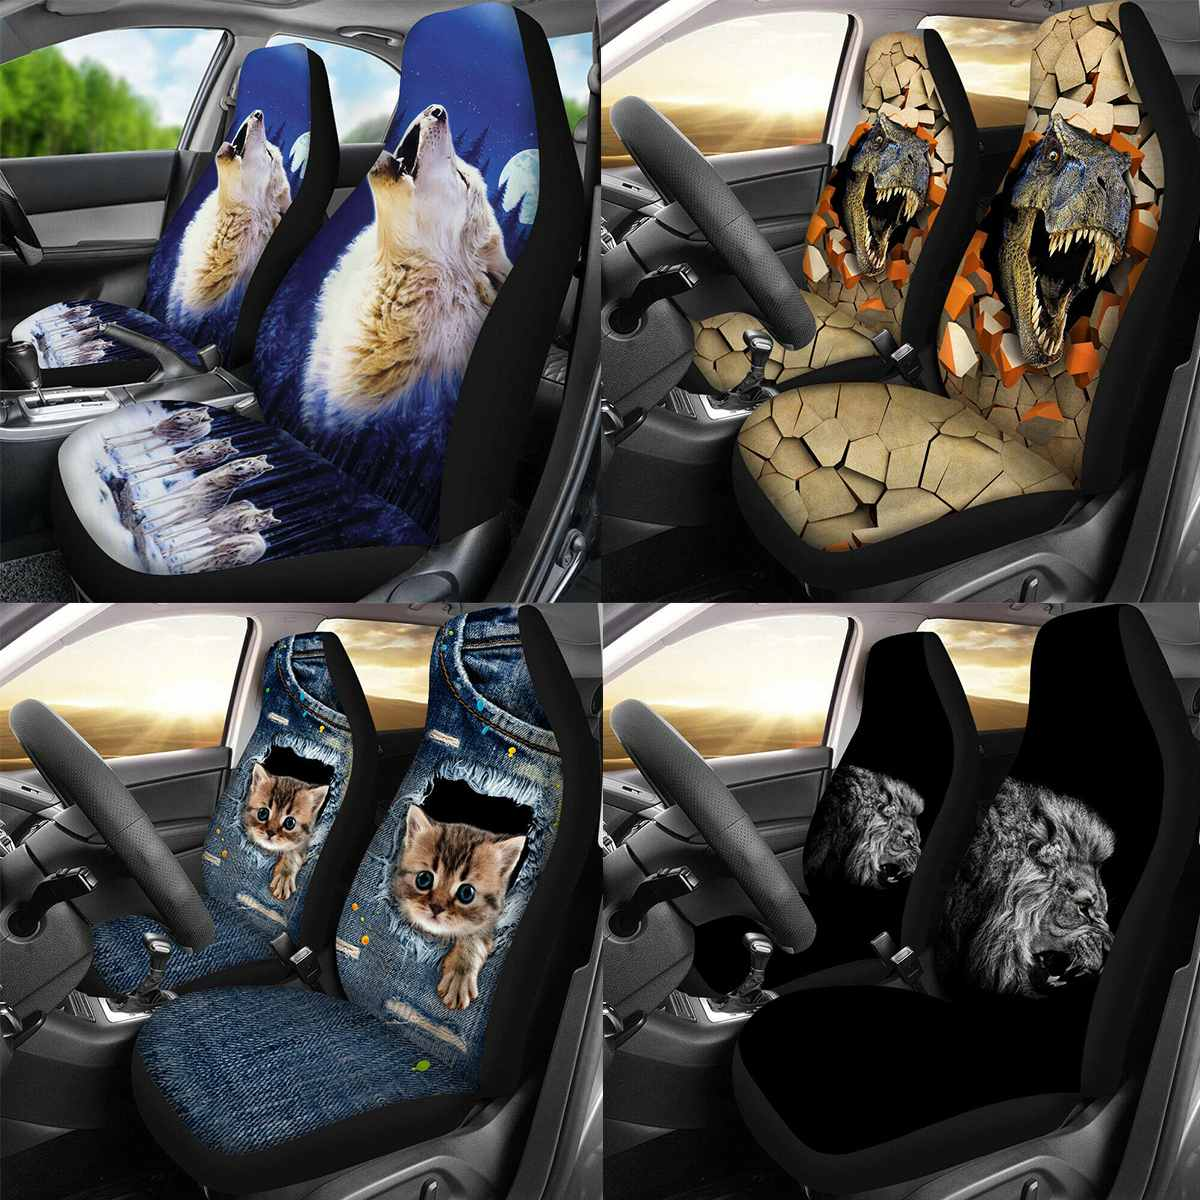 3D בעלי החיים זאב הדפסת אוניברסלי רכב מושב מכסה רכב סטיילינג אוטומטי מושב כיסוי מכונית מושב מלא כיסוי מגן אביזרי פנים